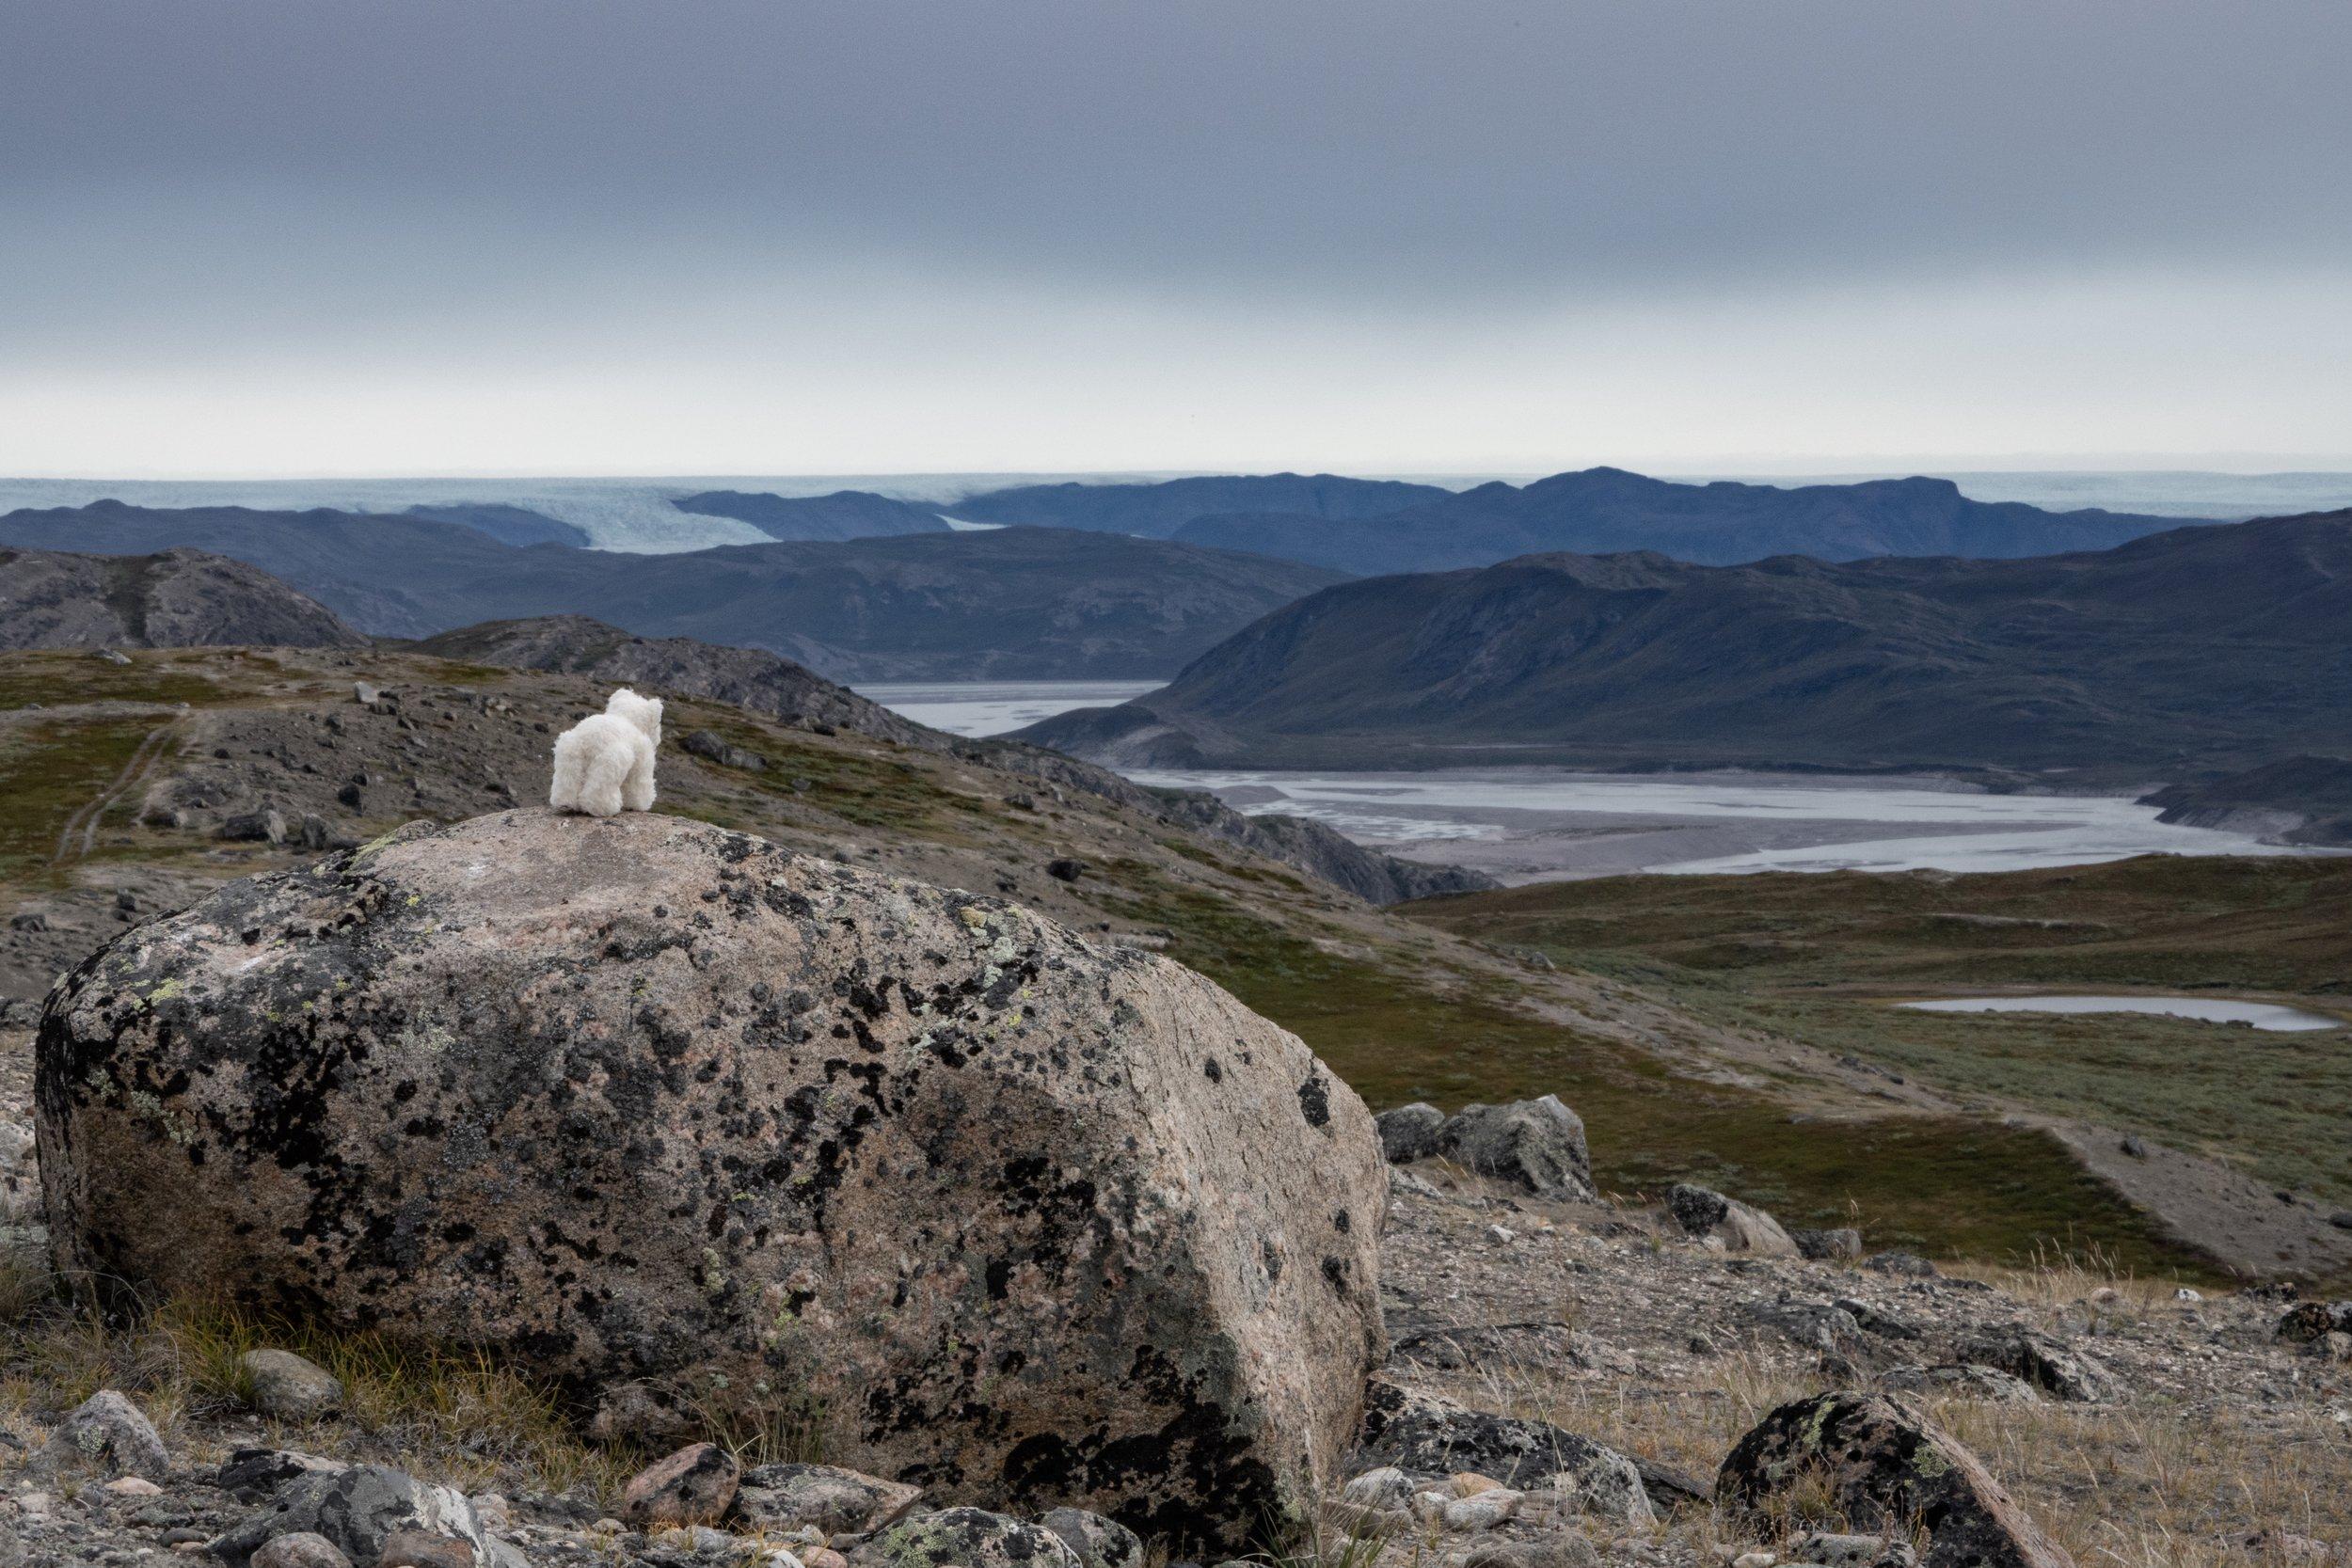 66°57'N | 50°58'W ● Kangerlussuaq | Greenland